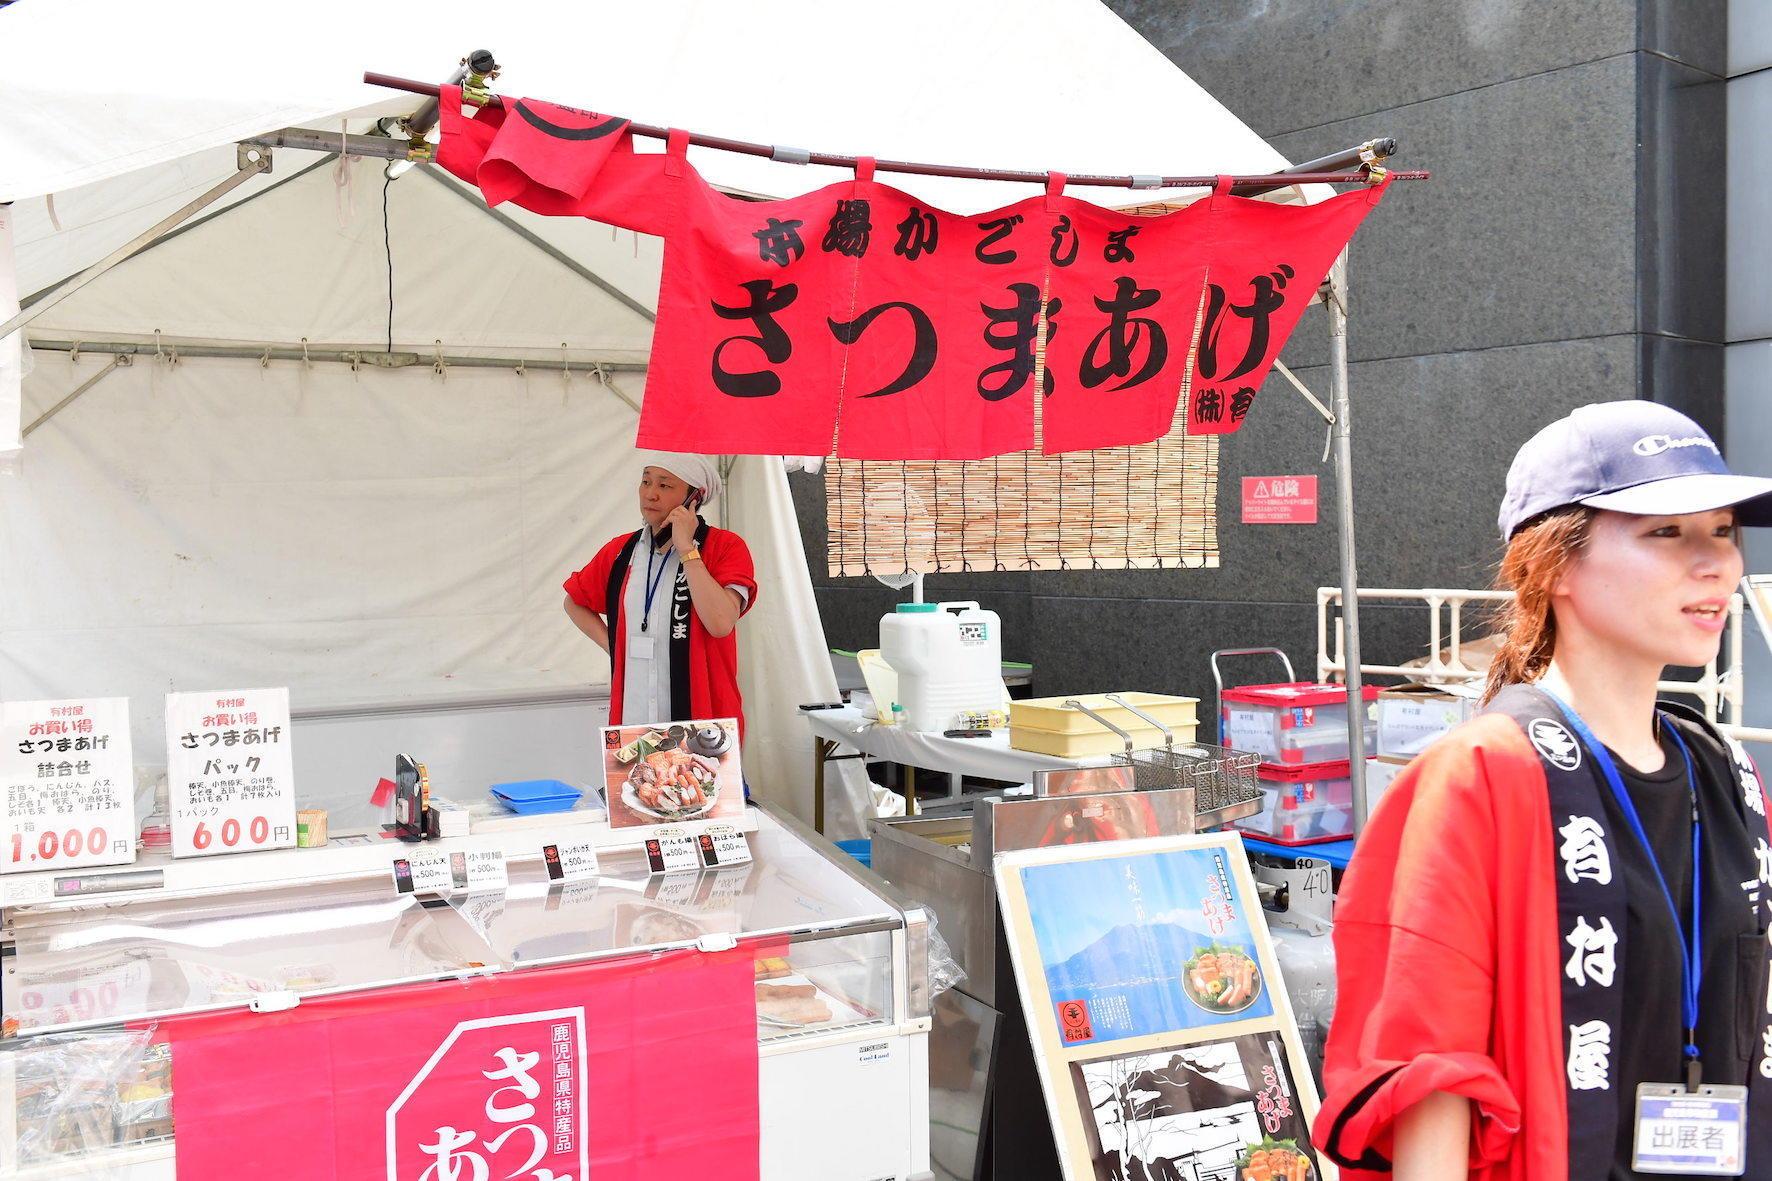 http://news.yoshimoto.co.jp/20180720190328-8840e92aed2ecc206327232e8bcc4a147cd5667a.jpg